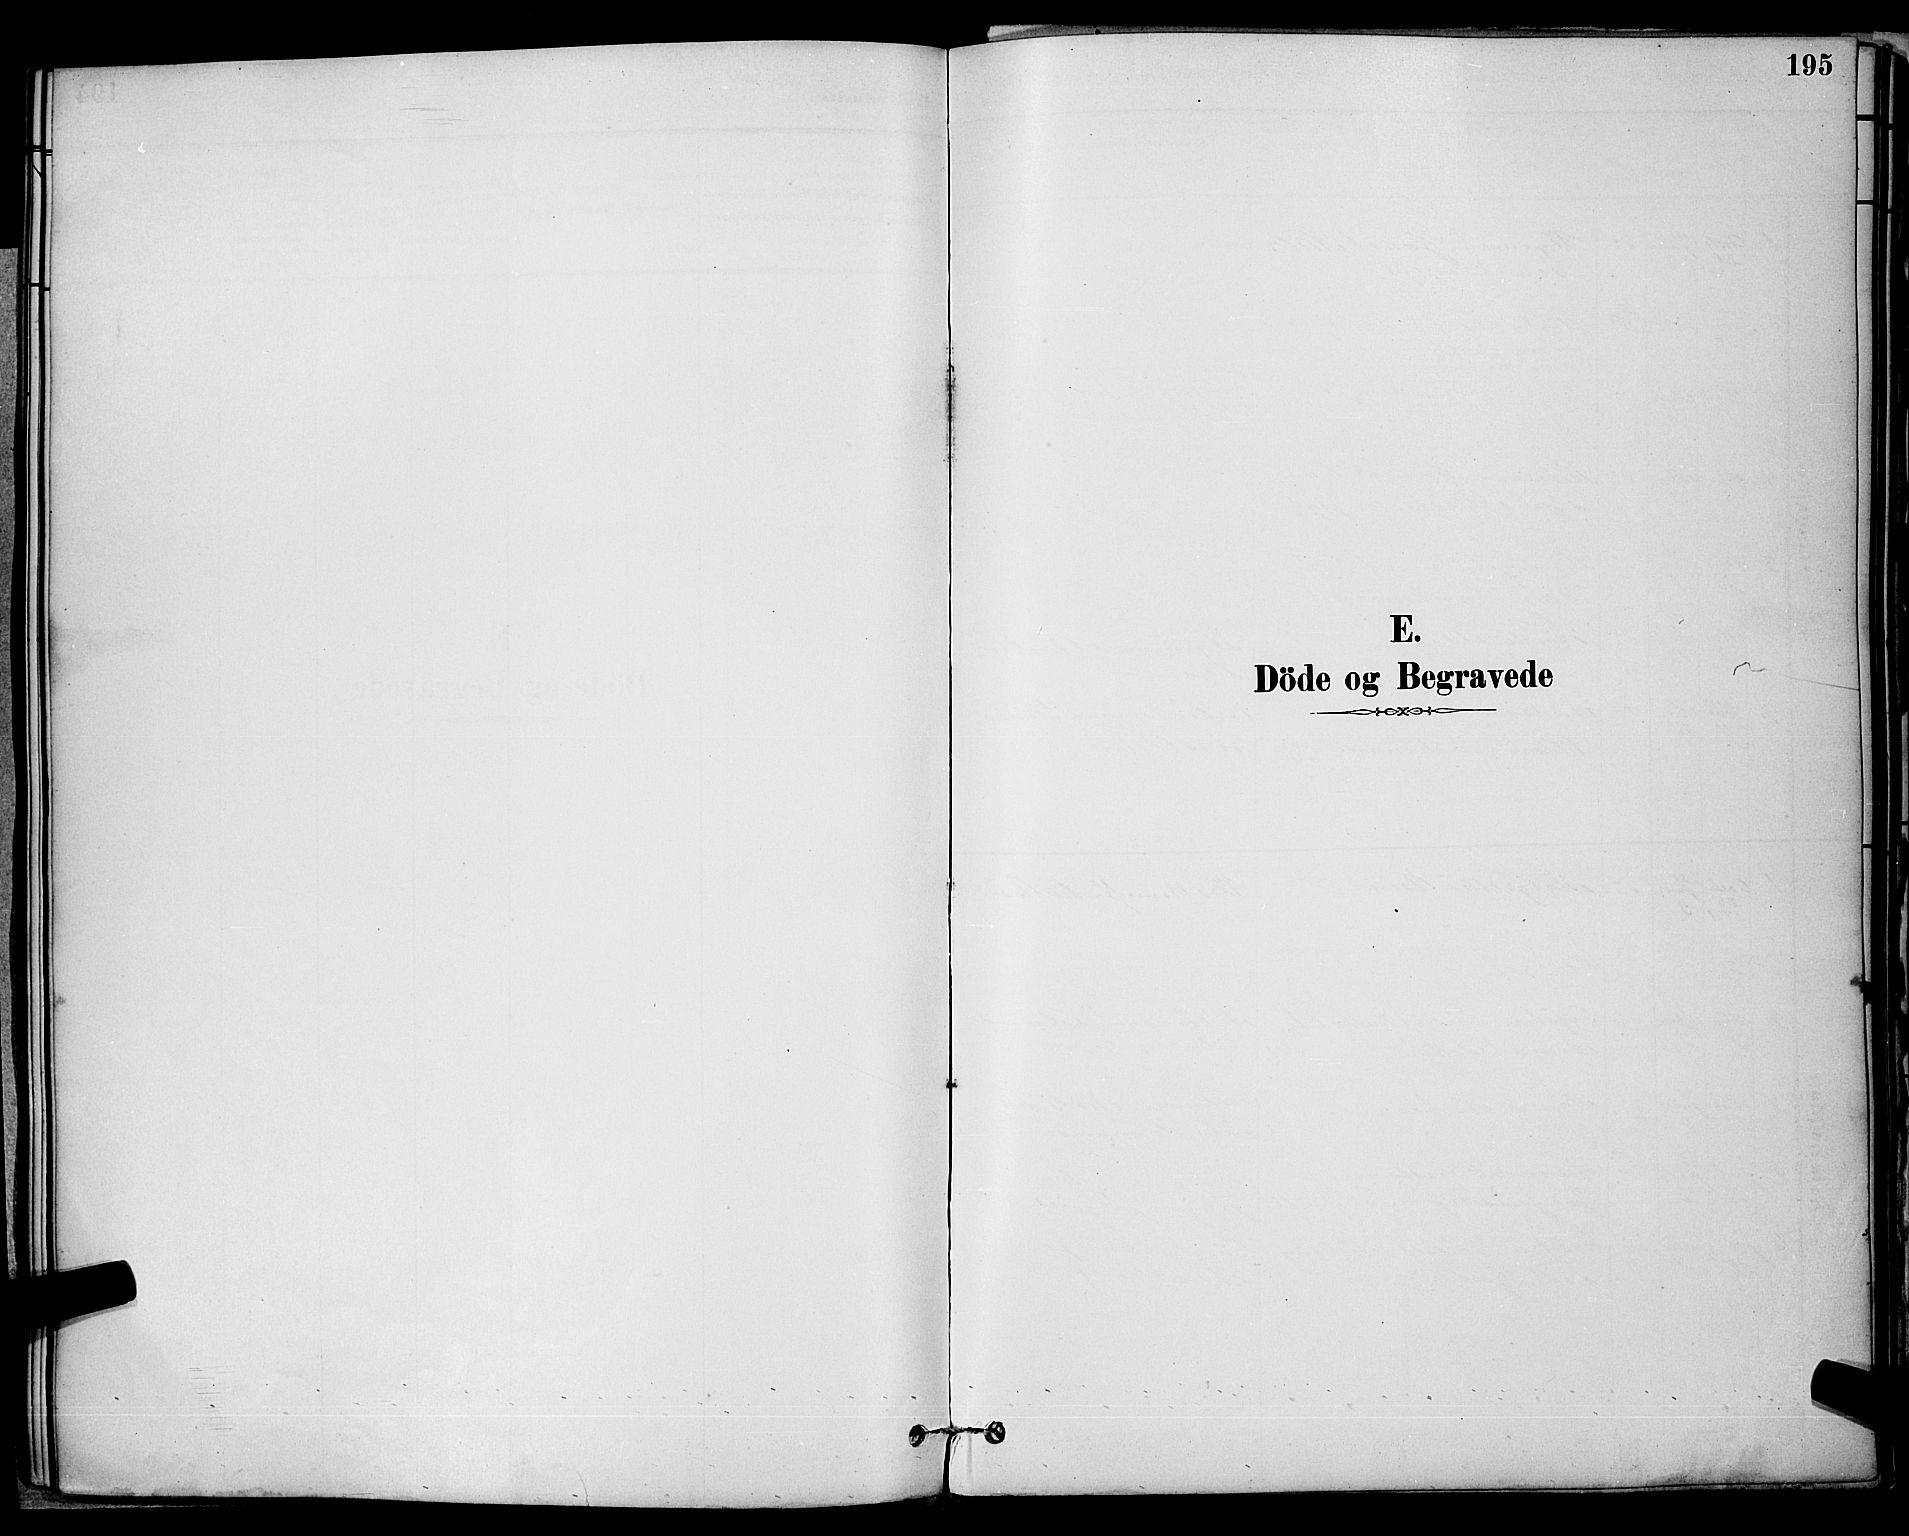 SAKO, Brevik kirkebøker, G/Ga/L0004: Klokkerbok nr. 4, 1882-1900, s. 195